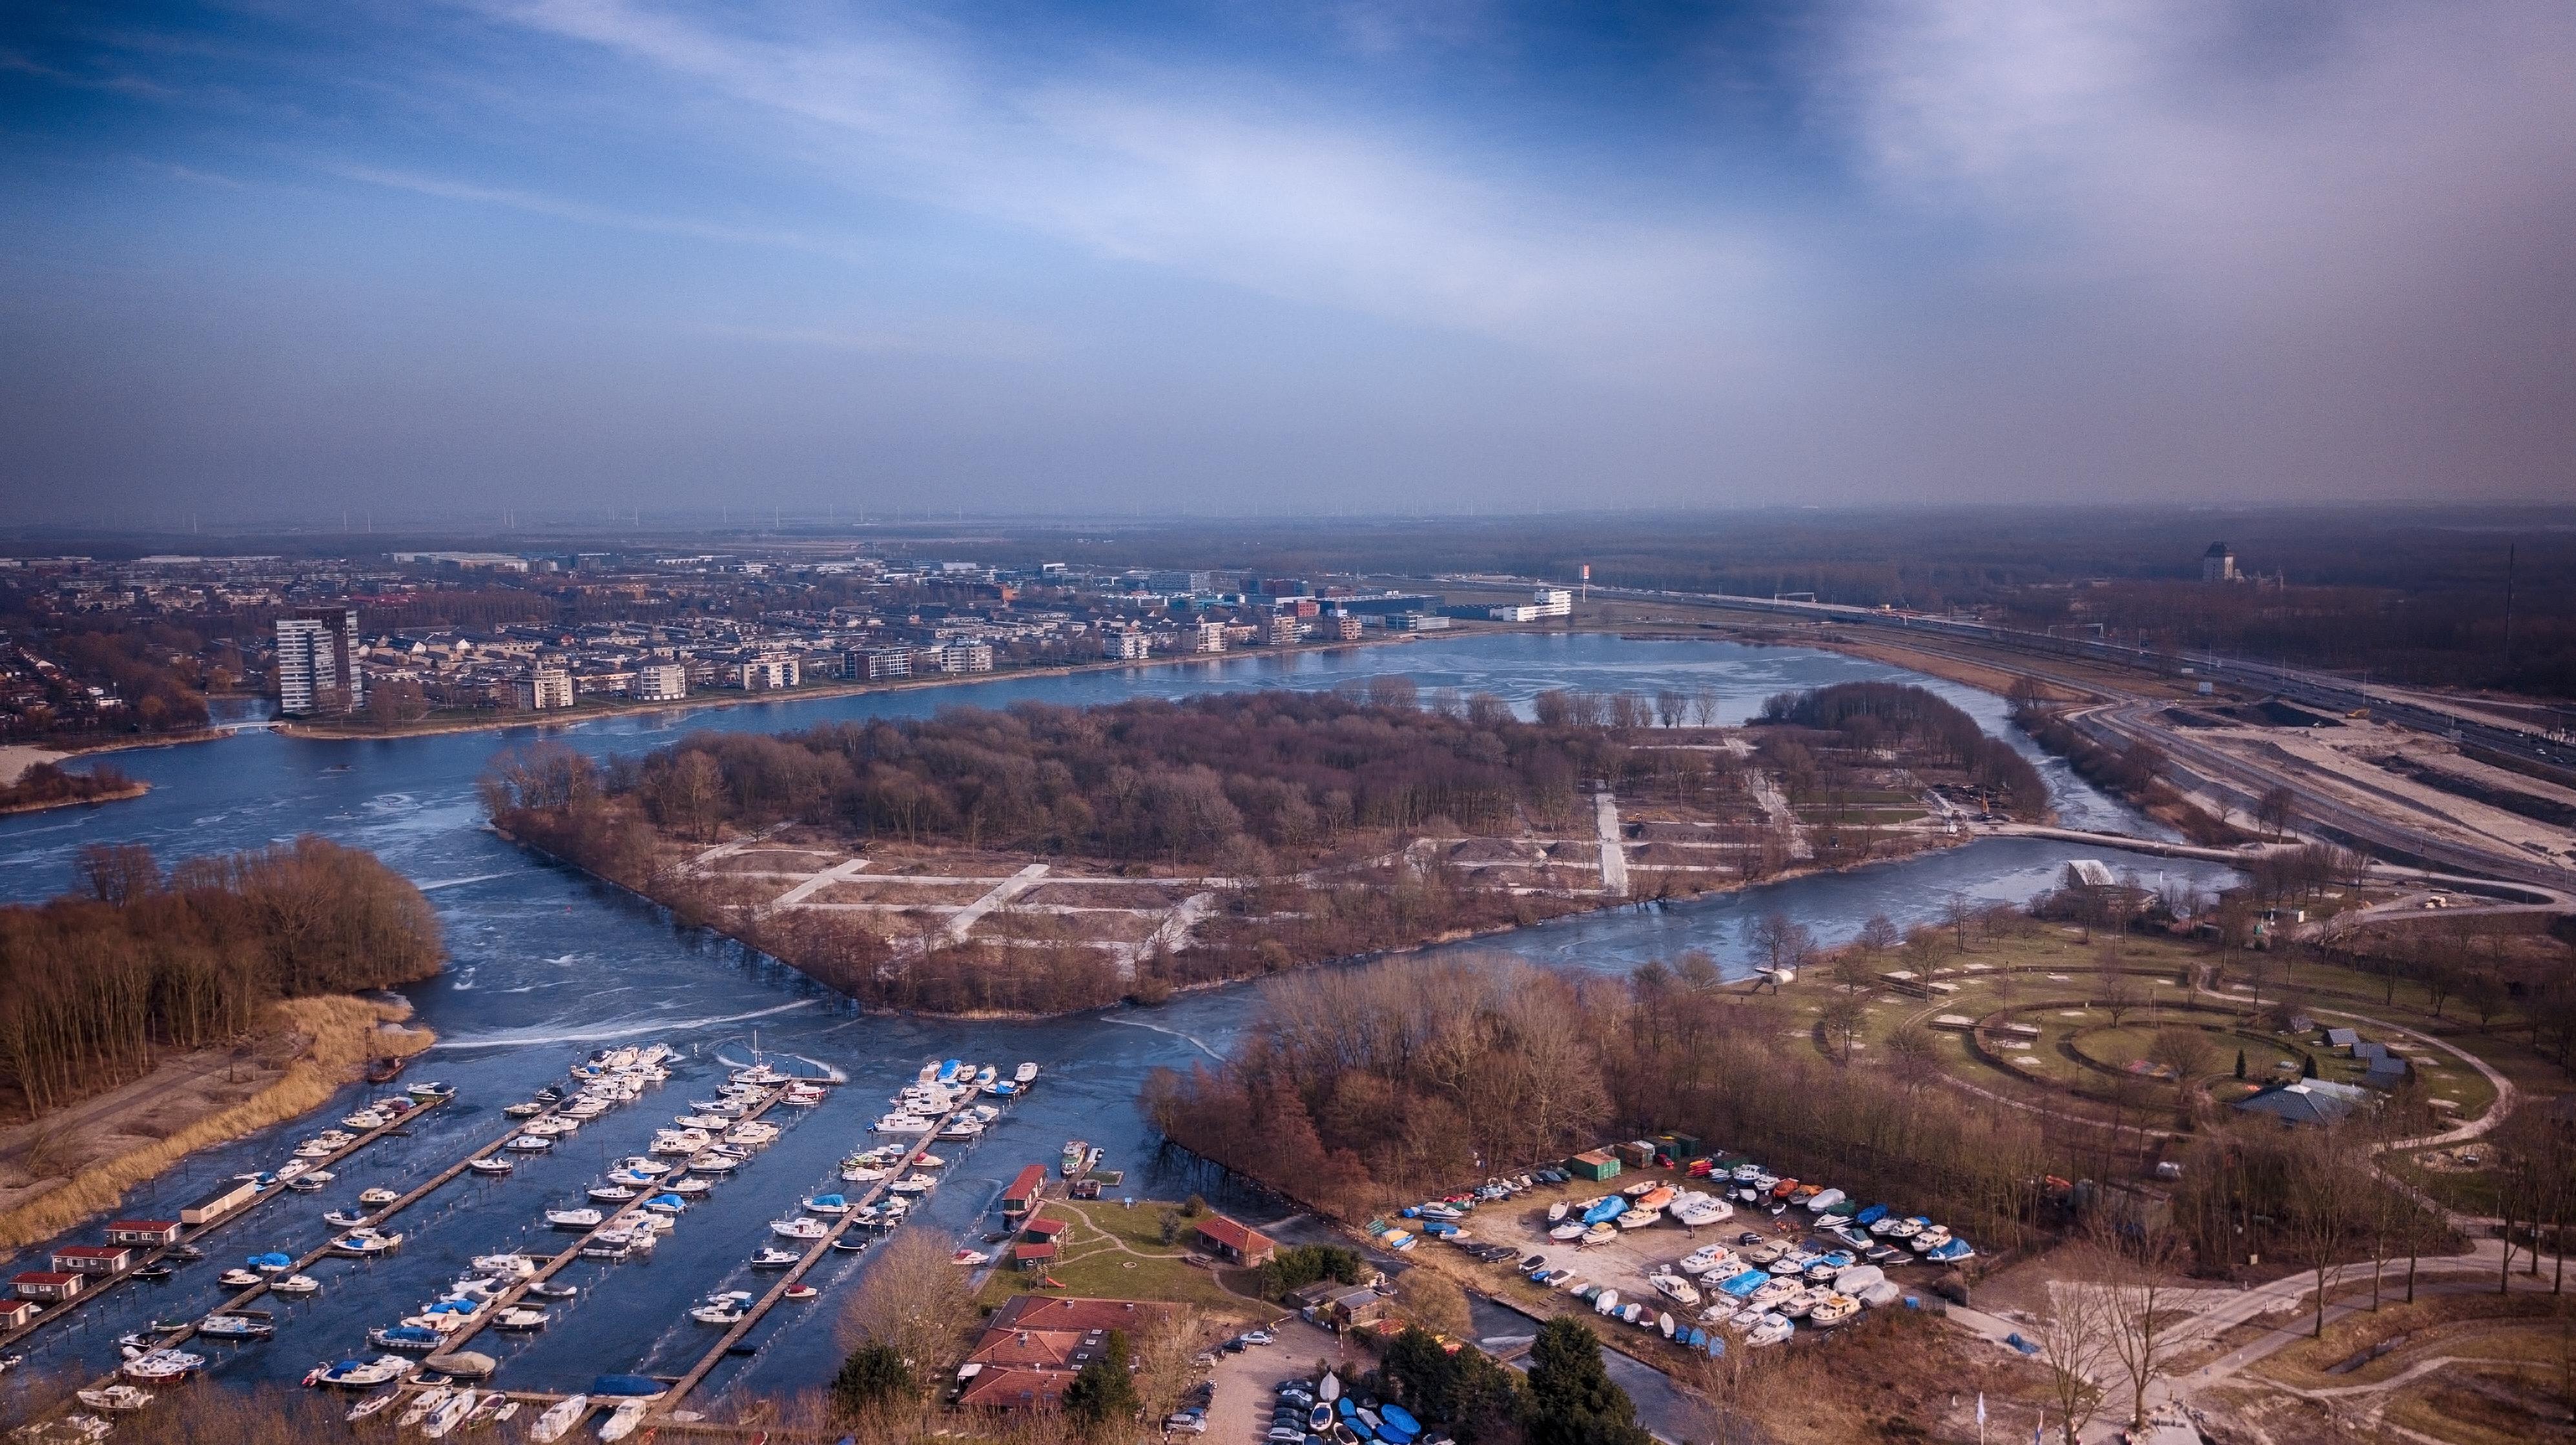 Floriade Almere 2022